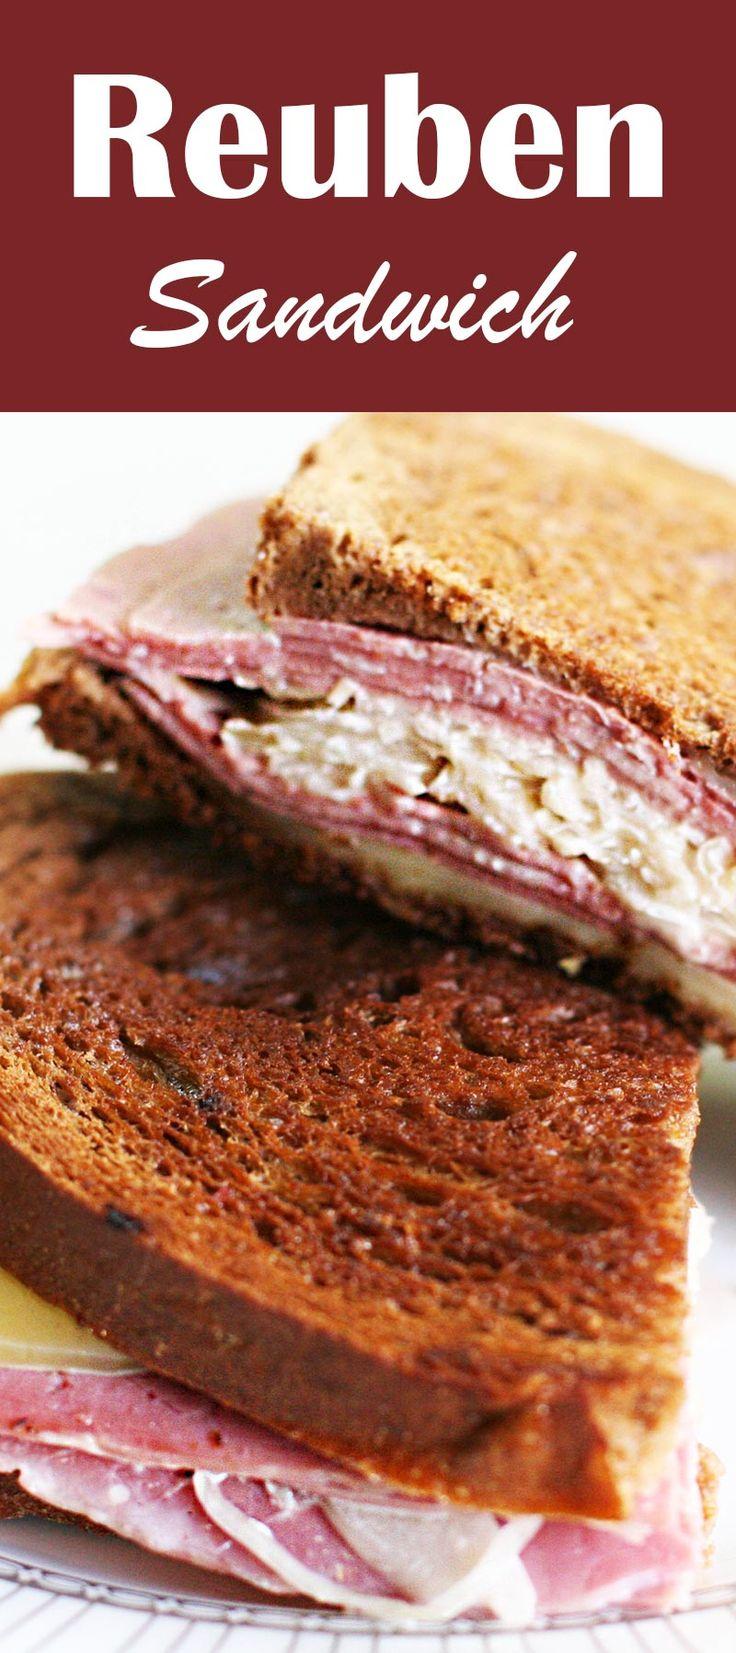 Reuben Sandwich ~ Classic reuben sandwich with corned beef, dark rye bread, Swiss cheese, sauerkraut, with Russian dressing! Great for your leftover #StPatricksDay corned beef!